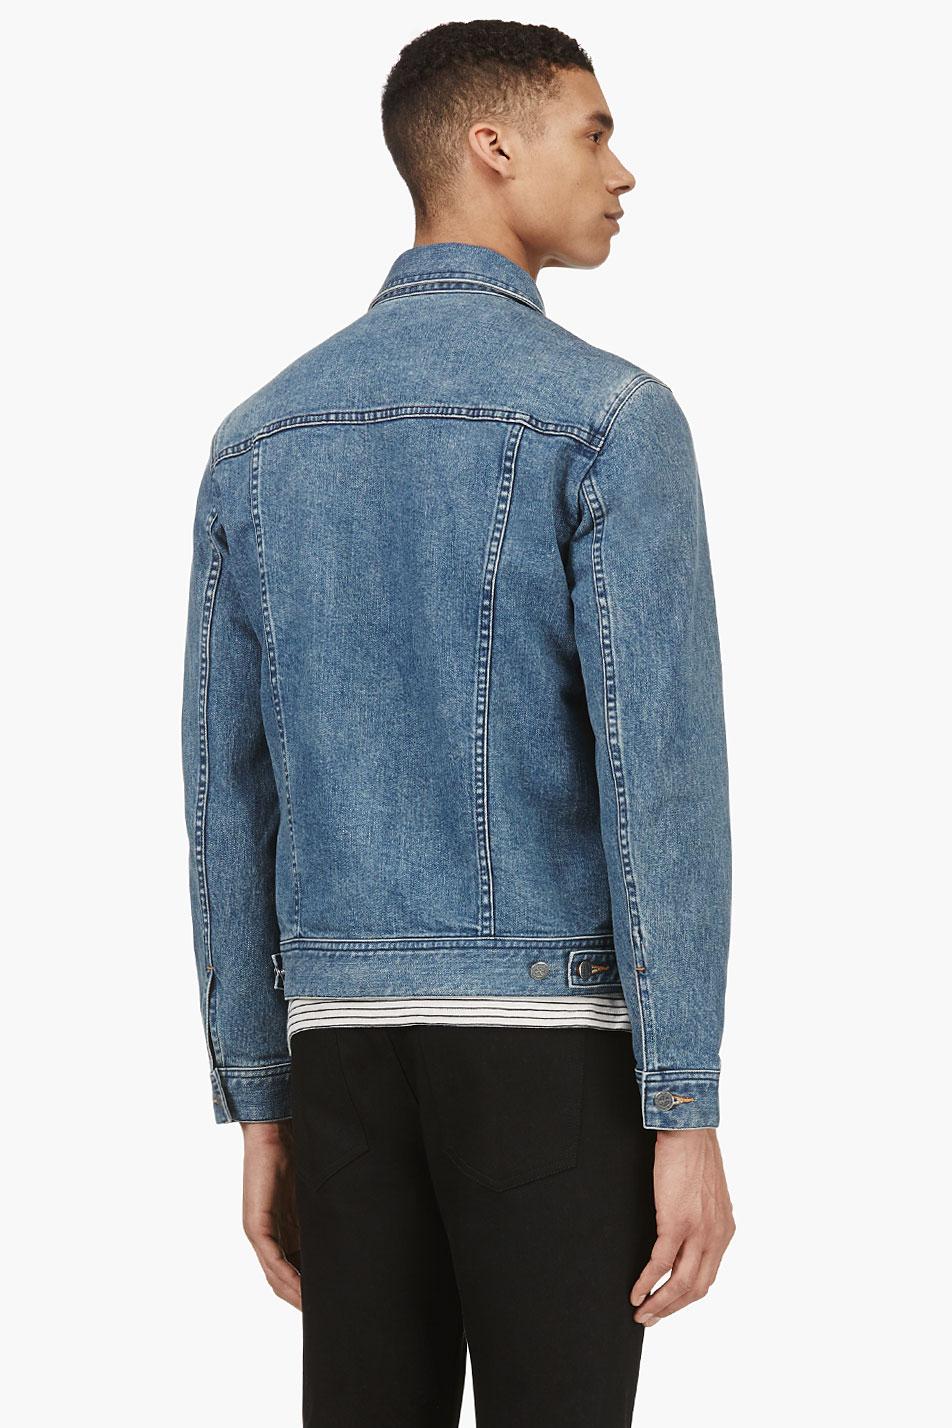 Lyst A P C Indigo Classic Denim Jacket In Blue For Men